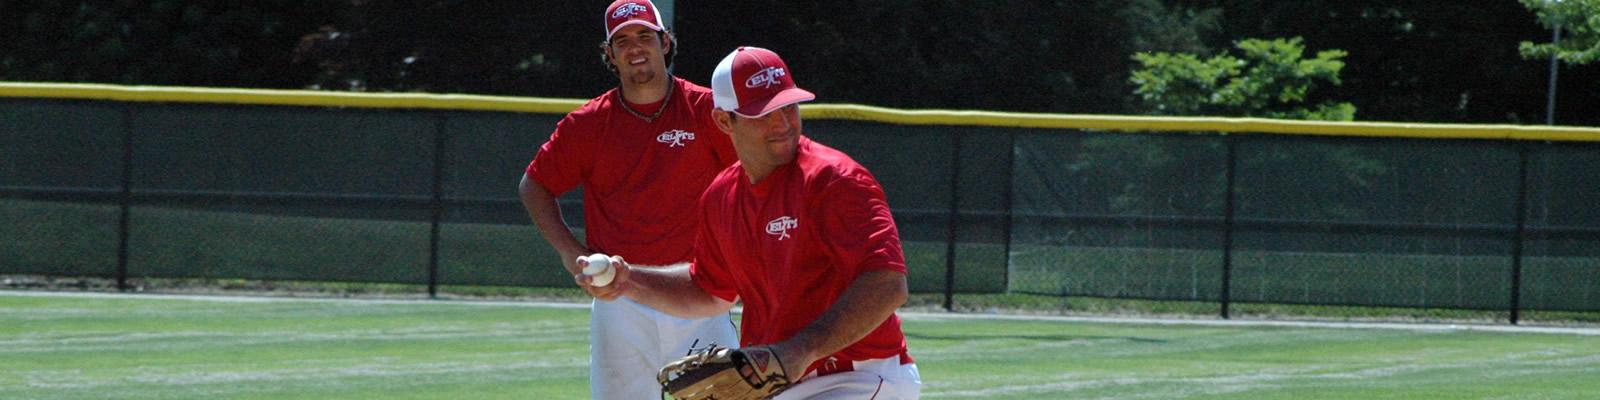 11u Schaffer « Chicago Youth Baseball Training & Instruction